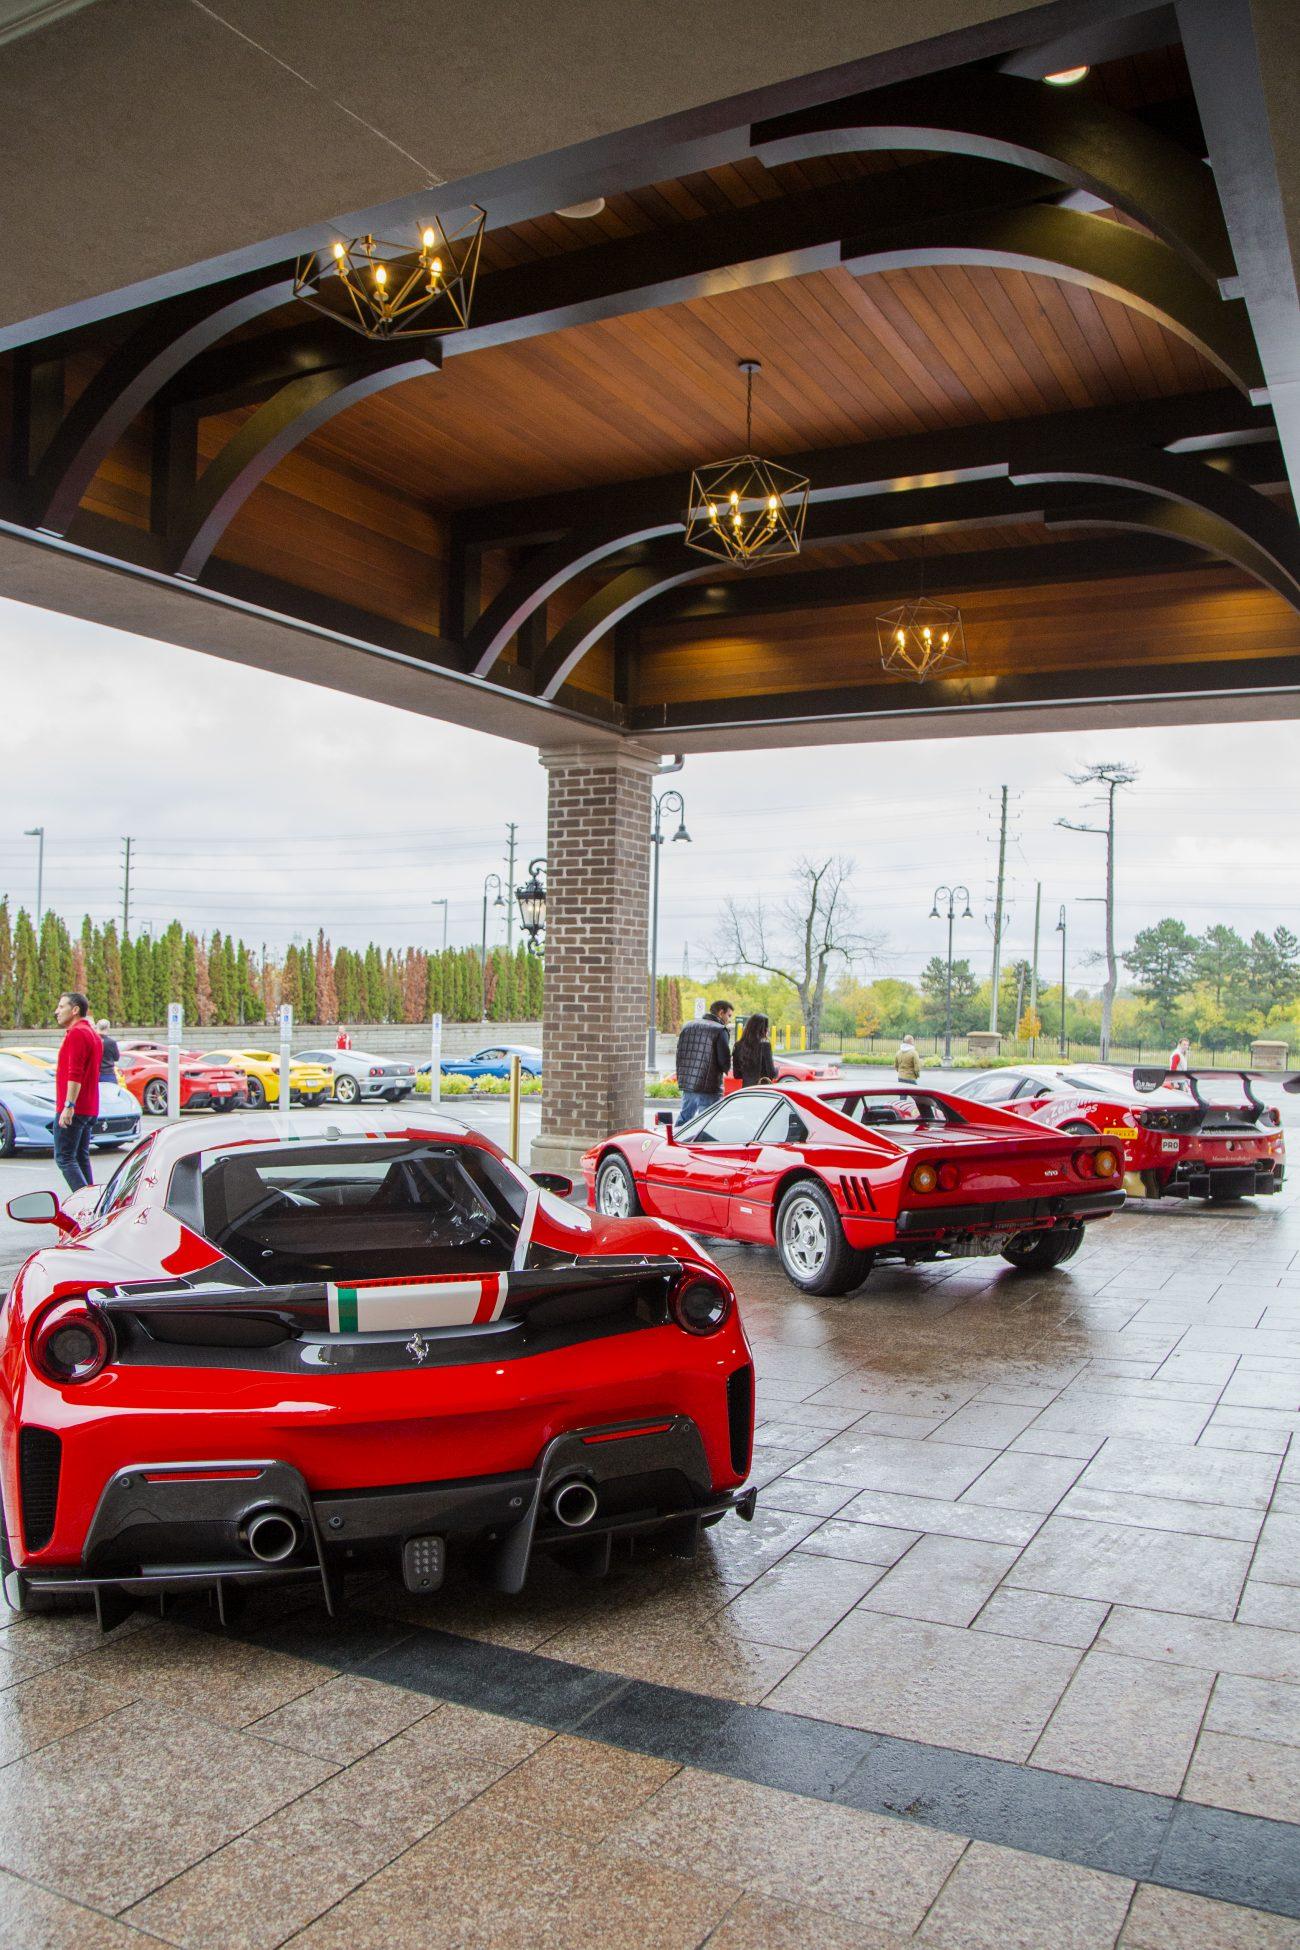 Ferrari Cars under East Carport